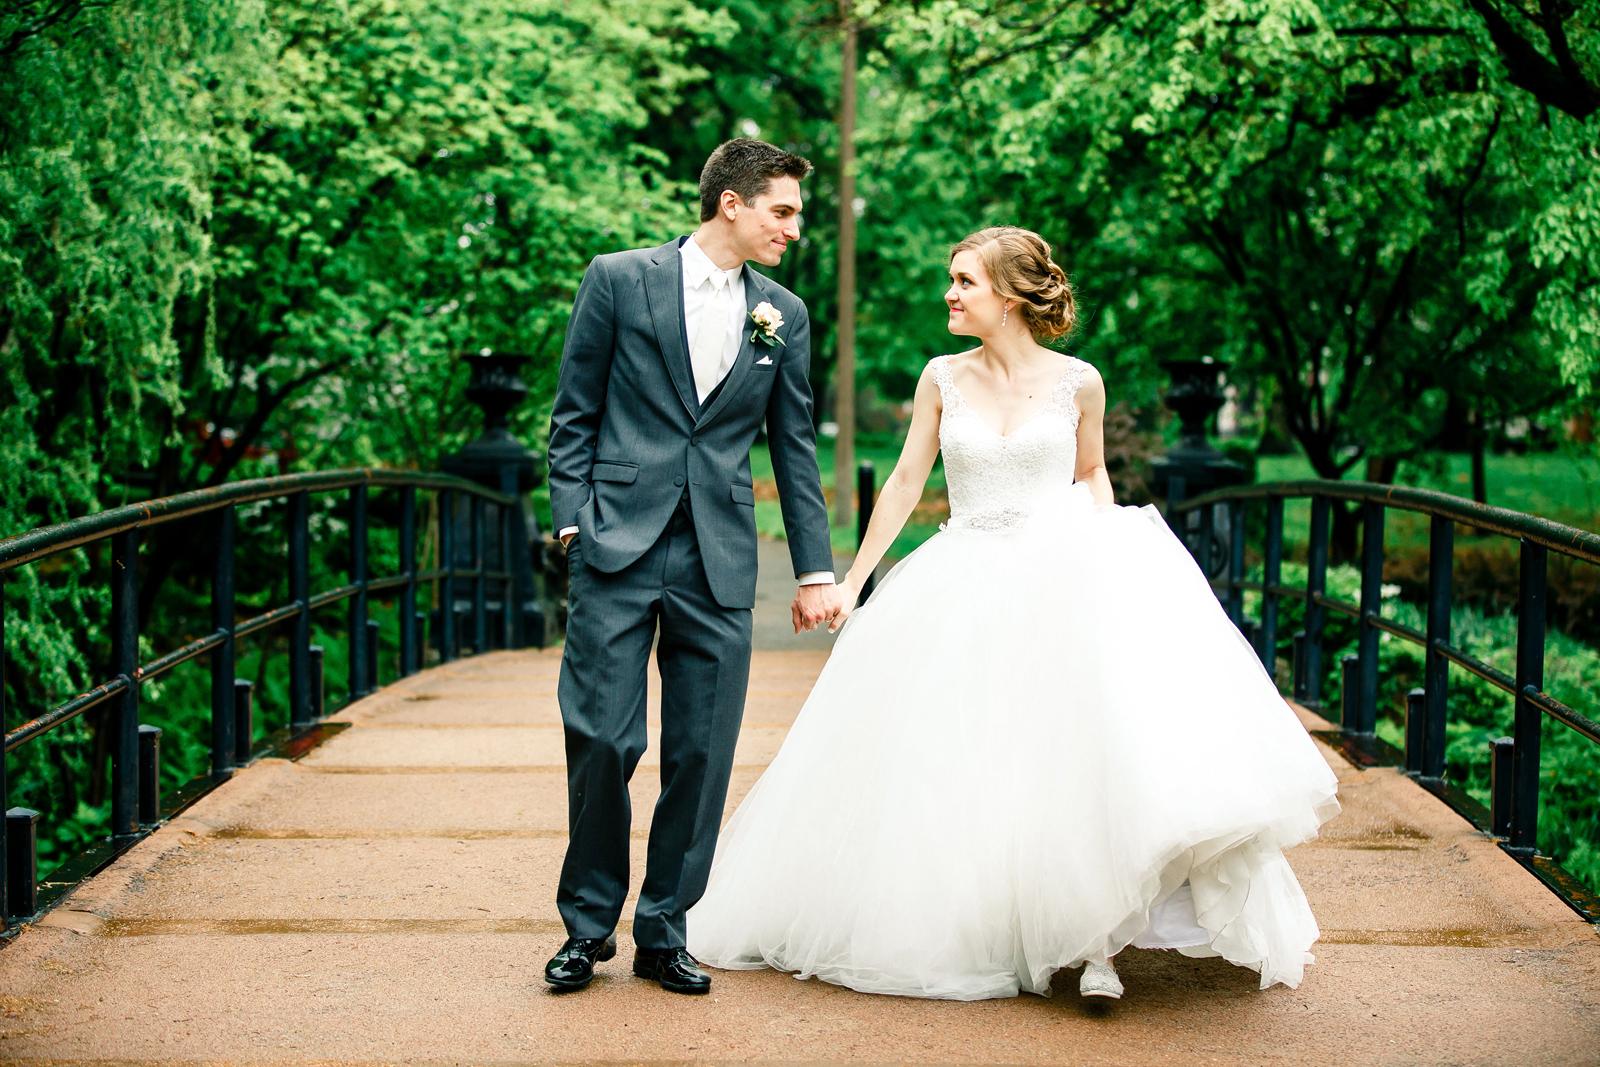 Bridal Portraits Lafayette Square Park Bride Groom St Louis Wedding Photographer Oldani Photography 2.jpg